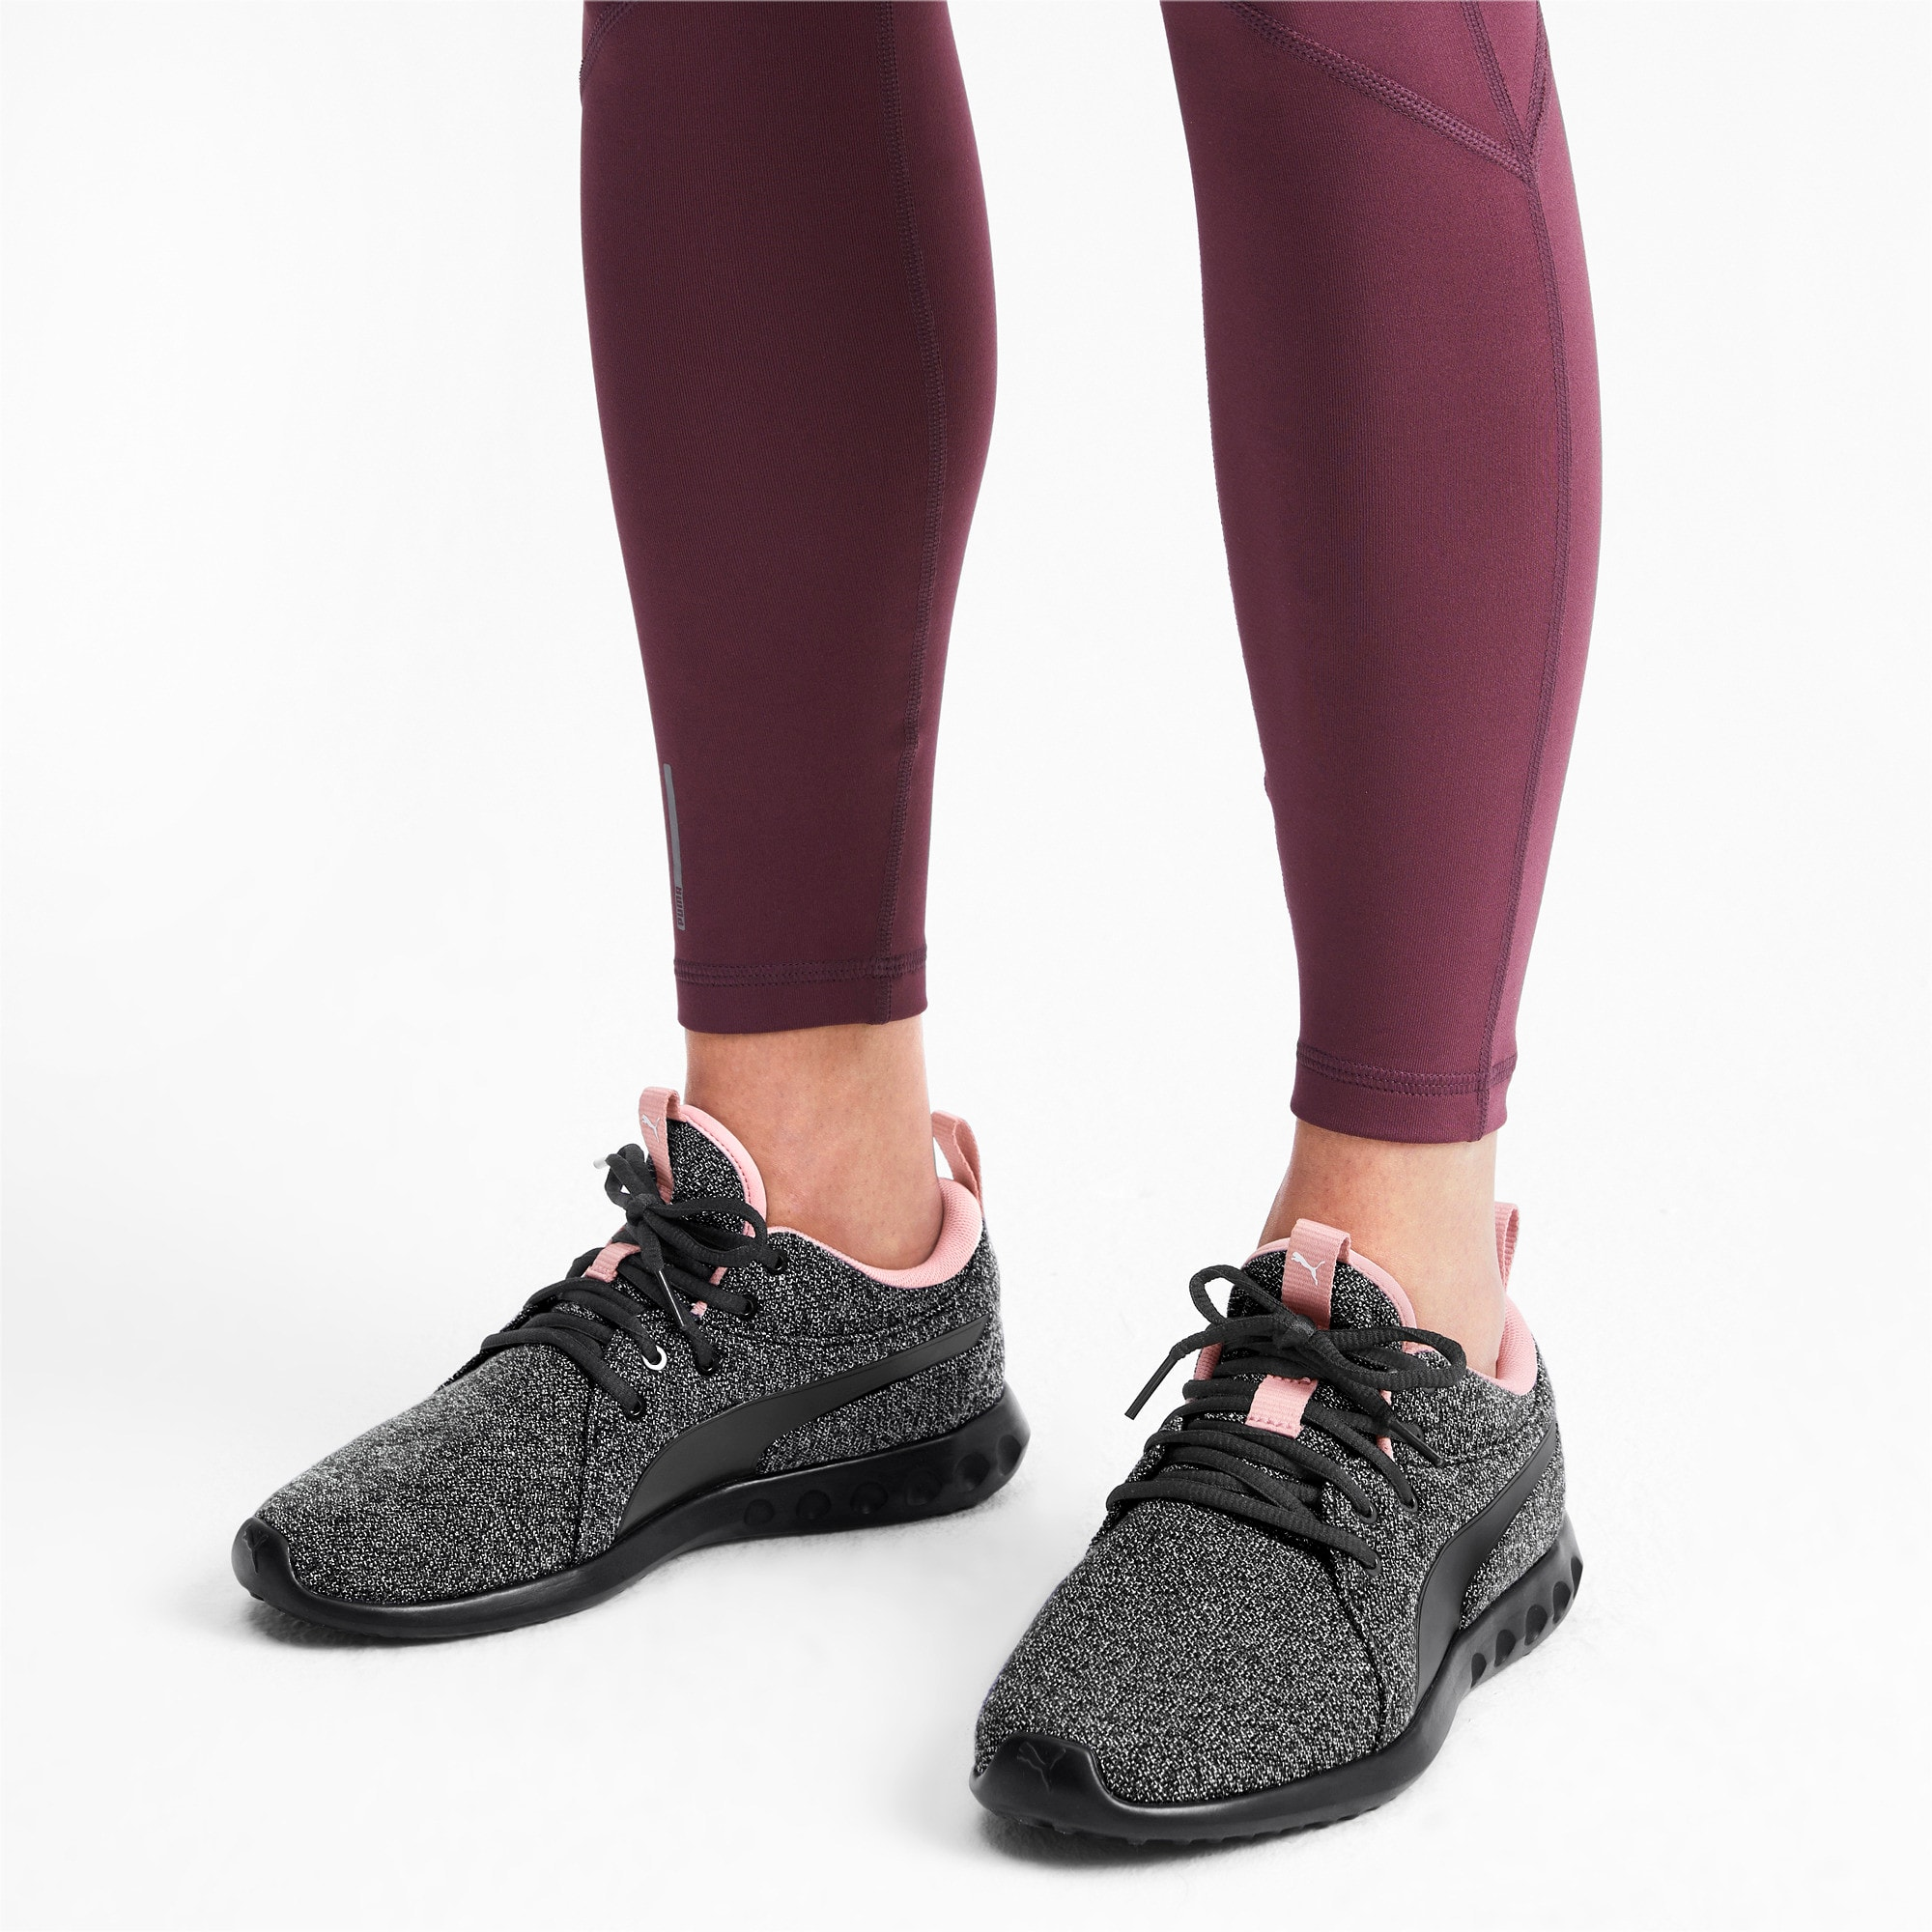 Thumbnail 3 of Carson 2 Knit Women's Running Shoes, Puma Black-White-Bridal Rose, medium